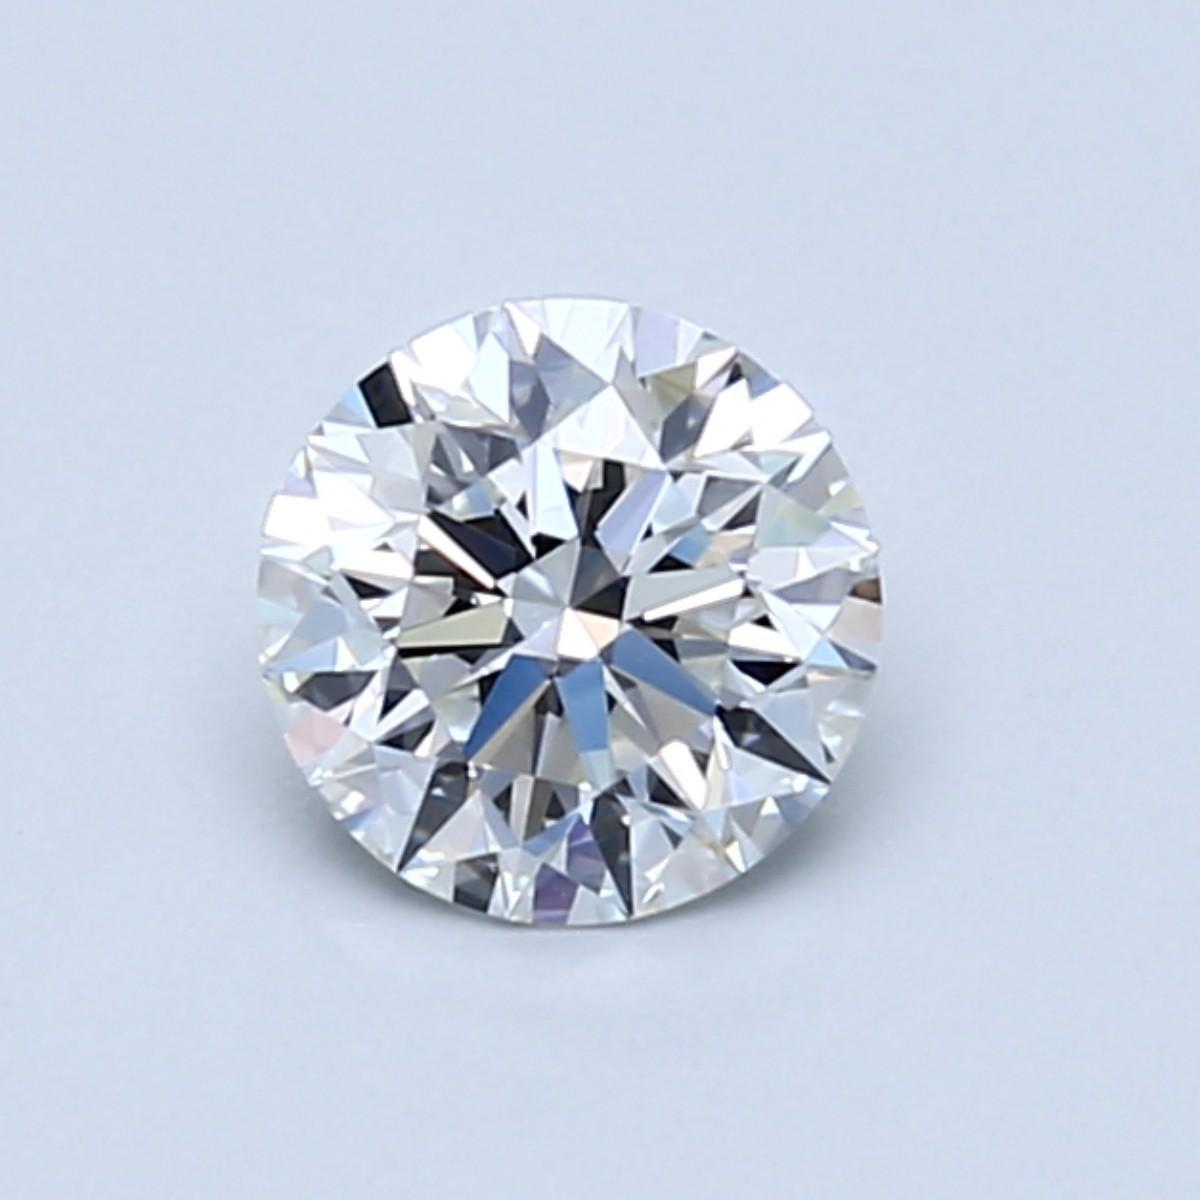 Blue Nile 0.73克拉圆形切割钻石